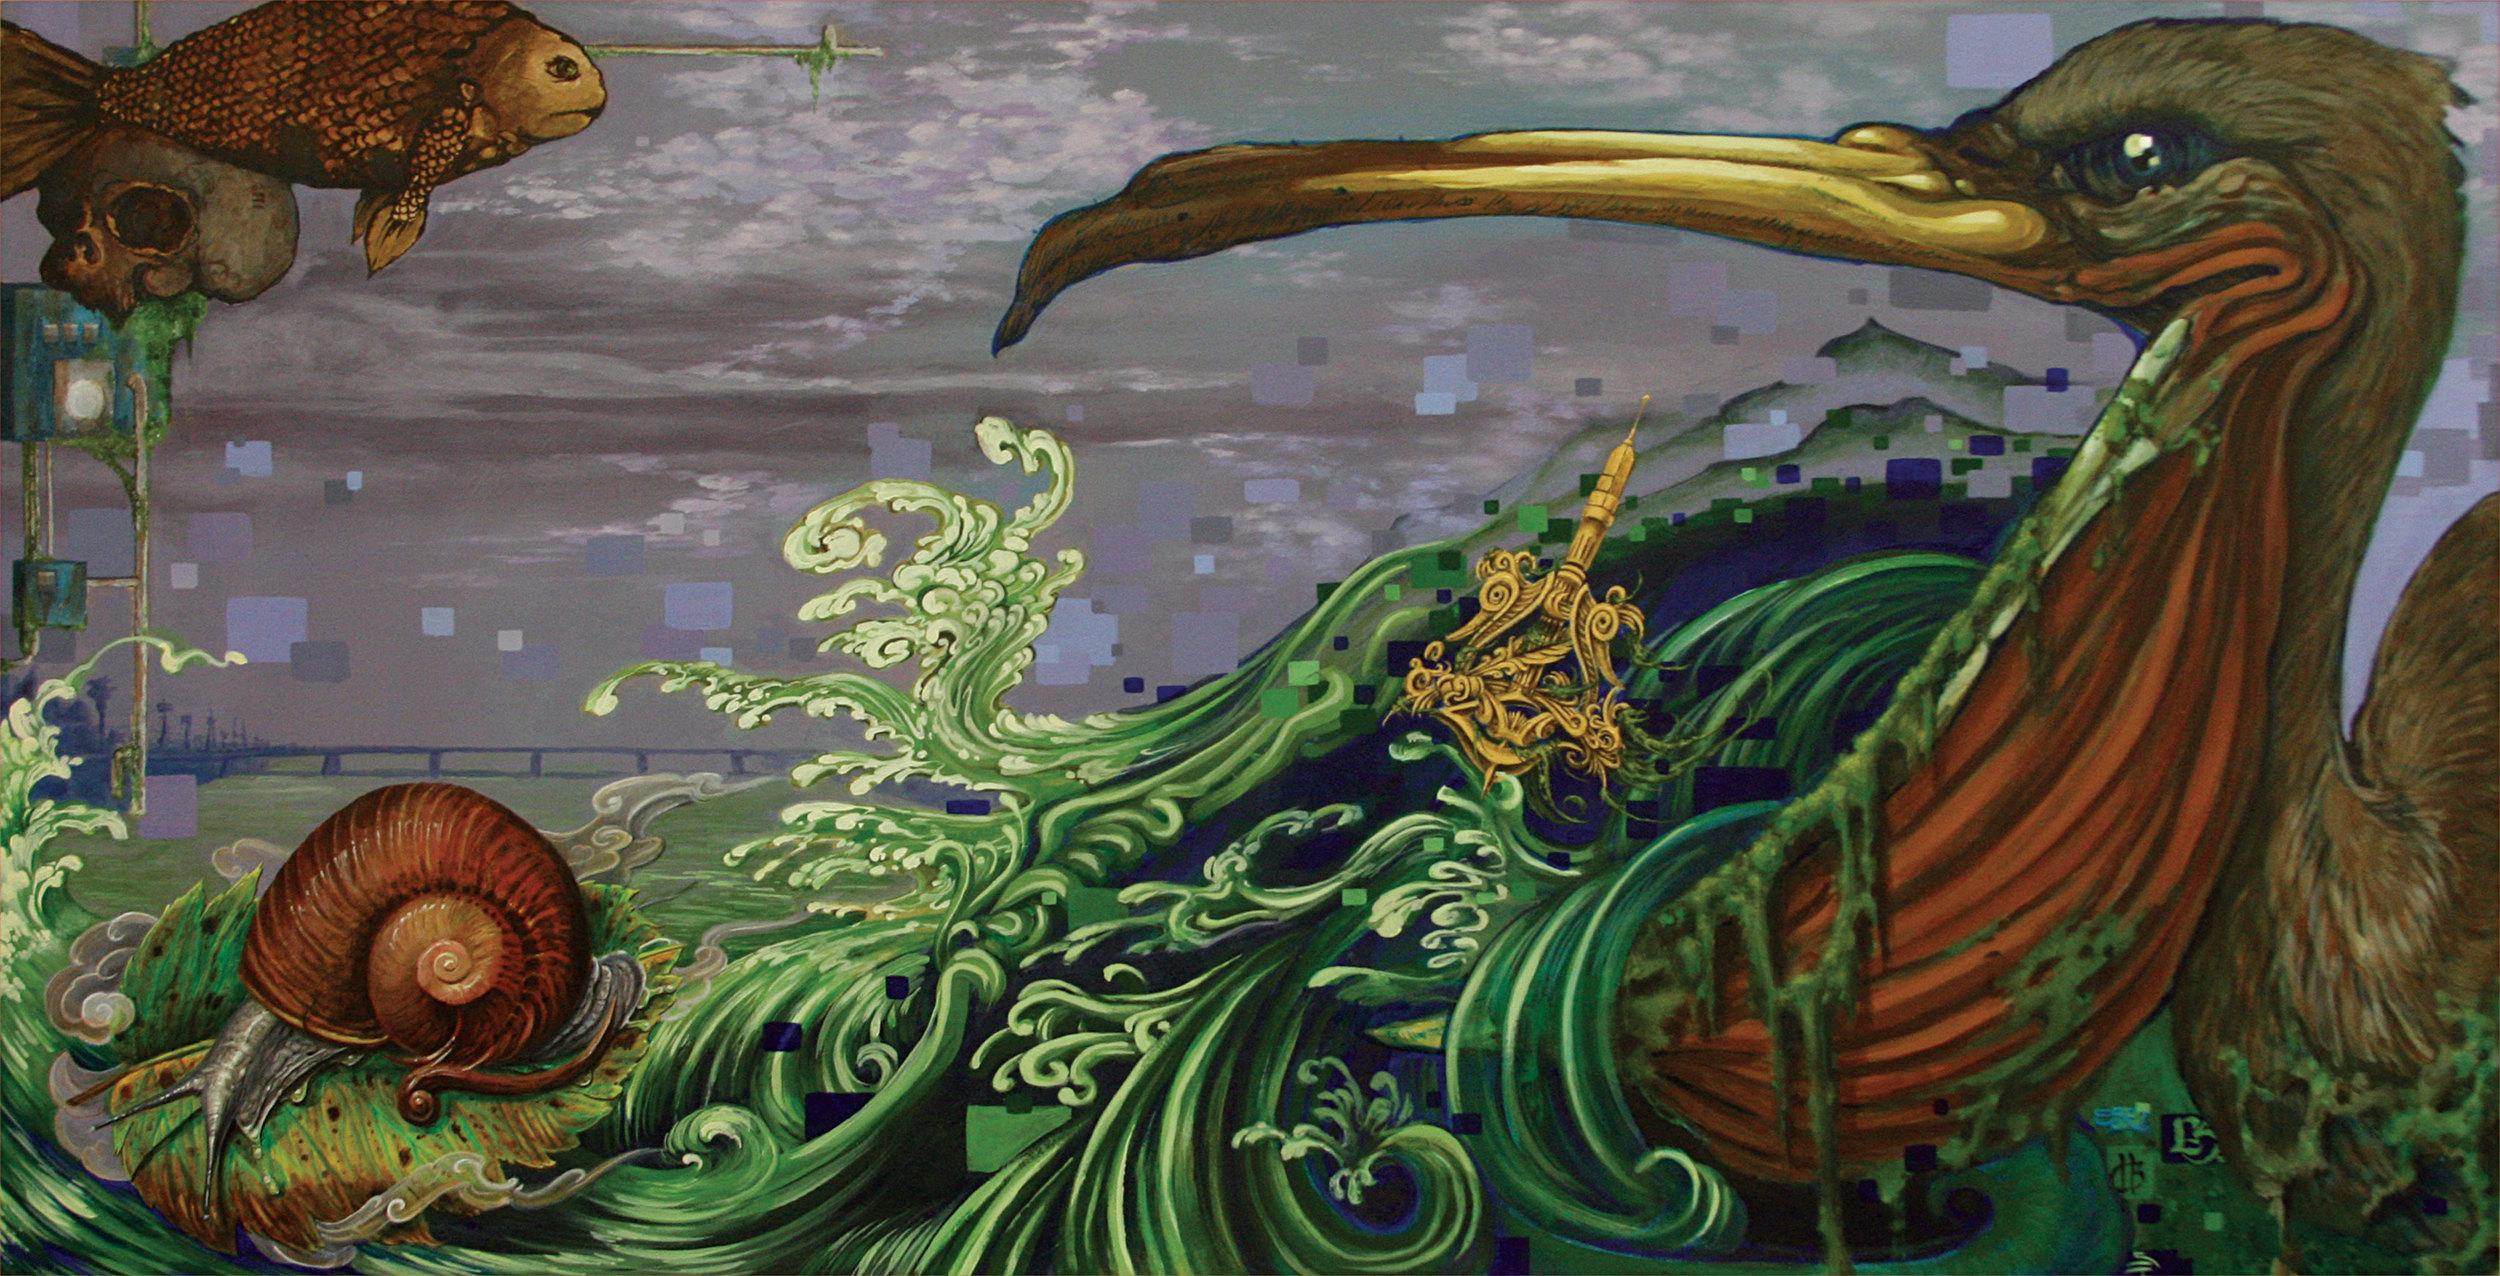 Christopher Brand, Evan Skrederstu, Espi & Steve Martinez. It Flows. 2009 - acrylic on board. 2' x 4'.